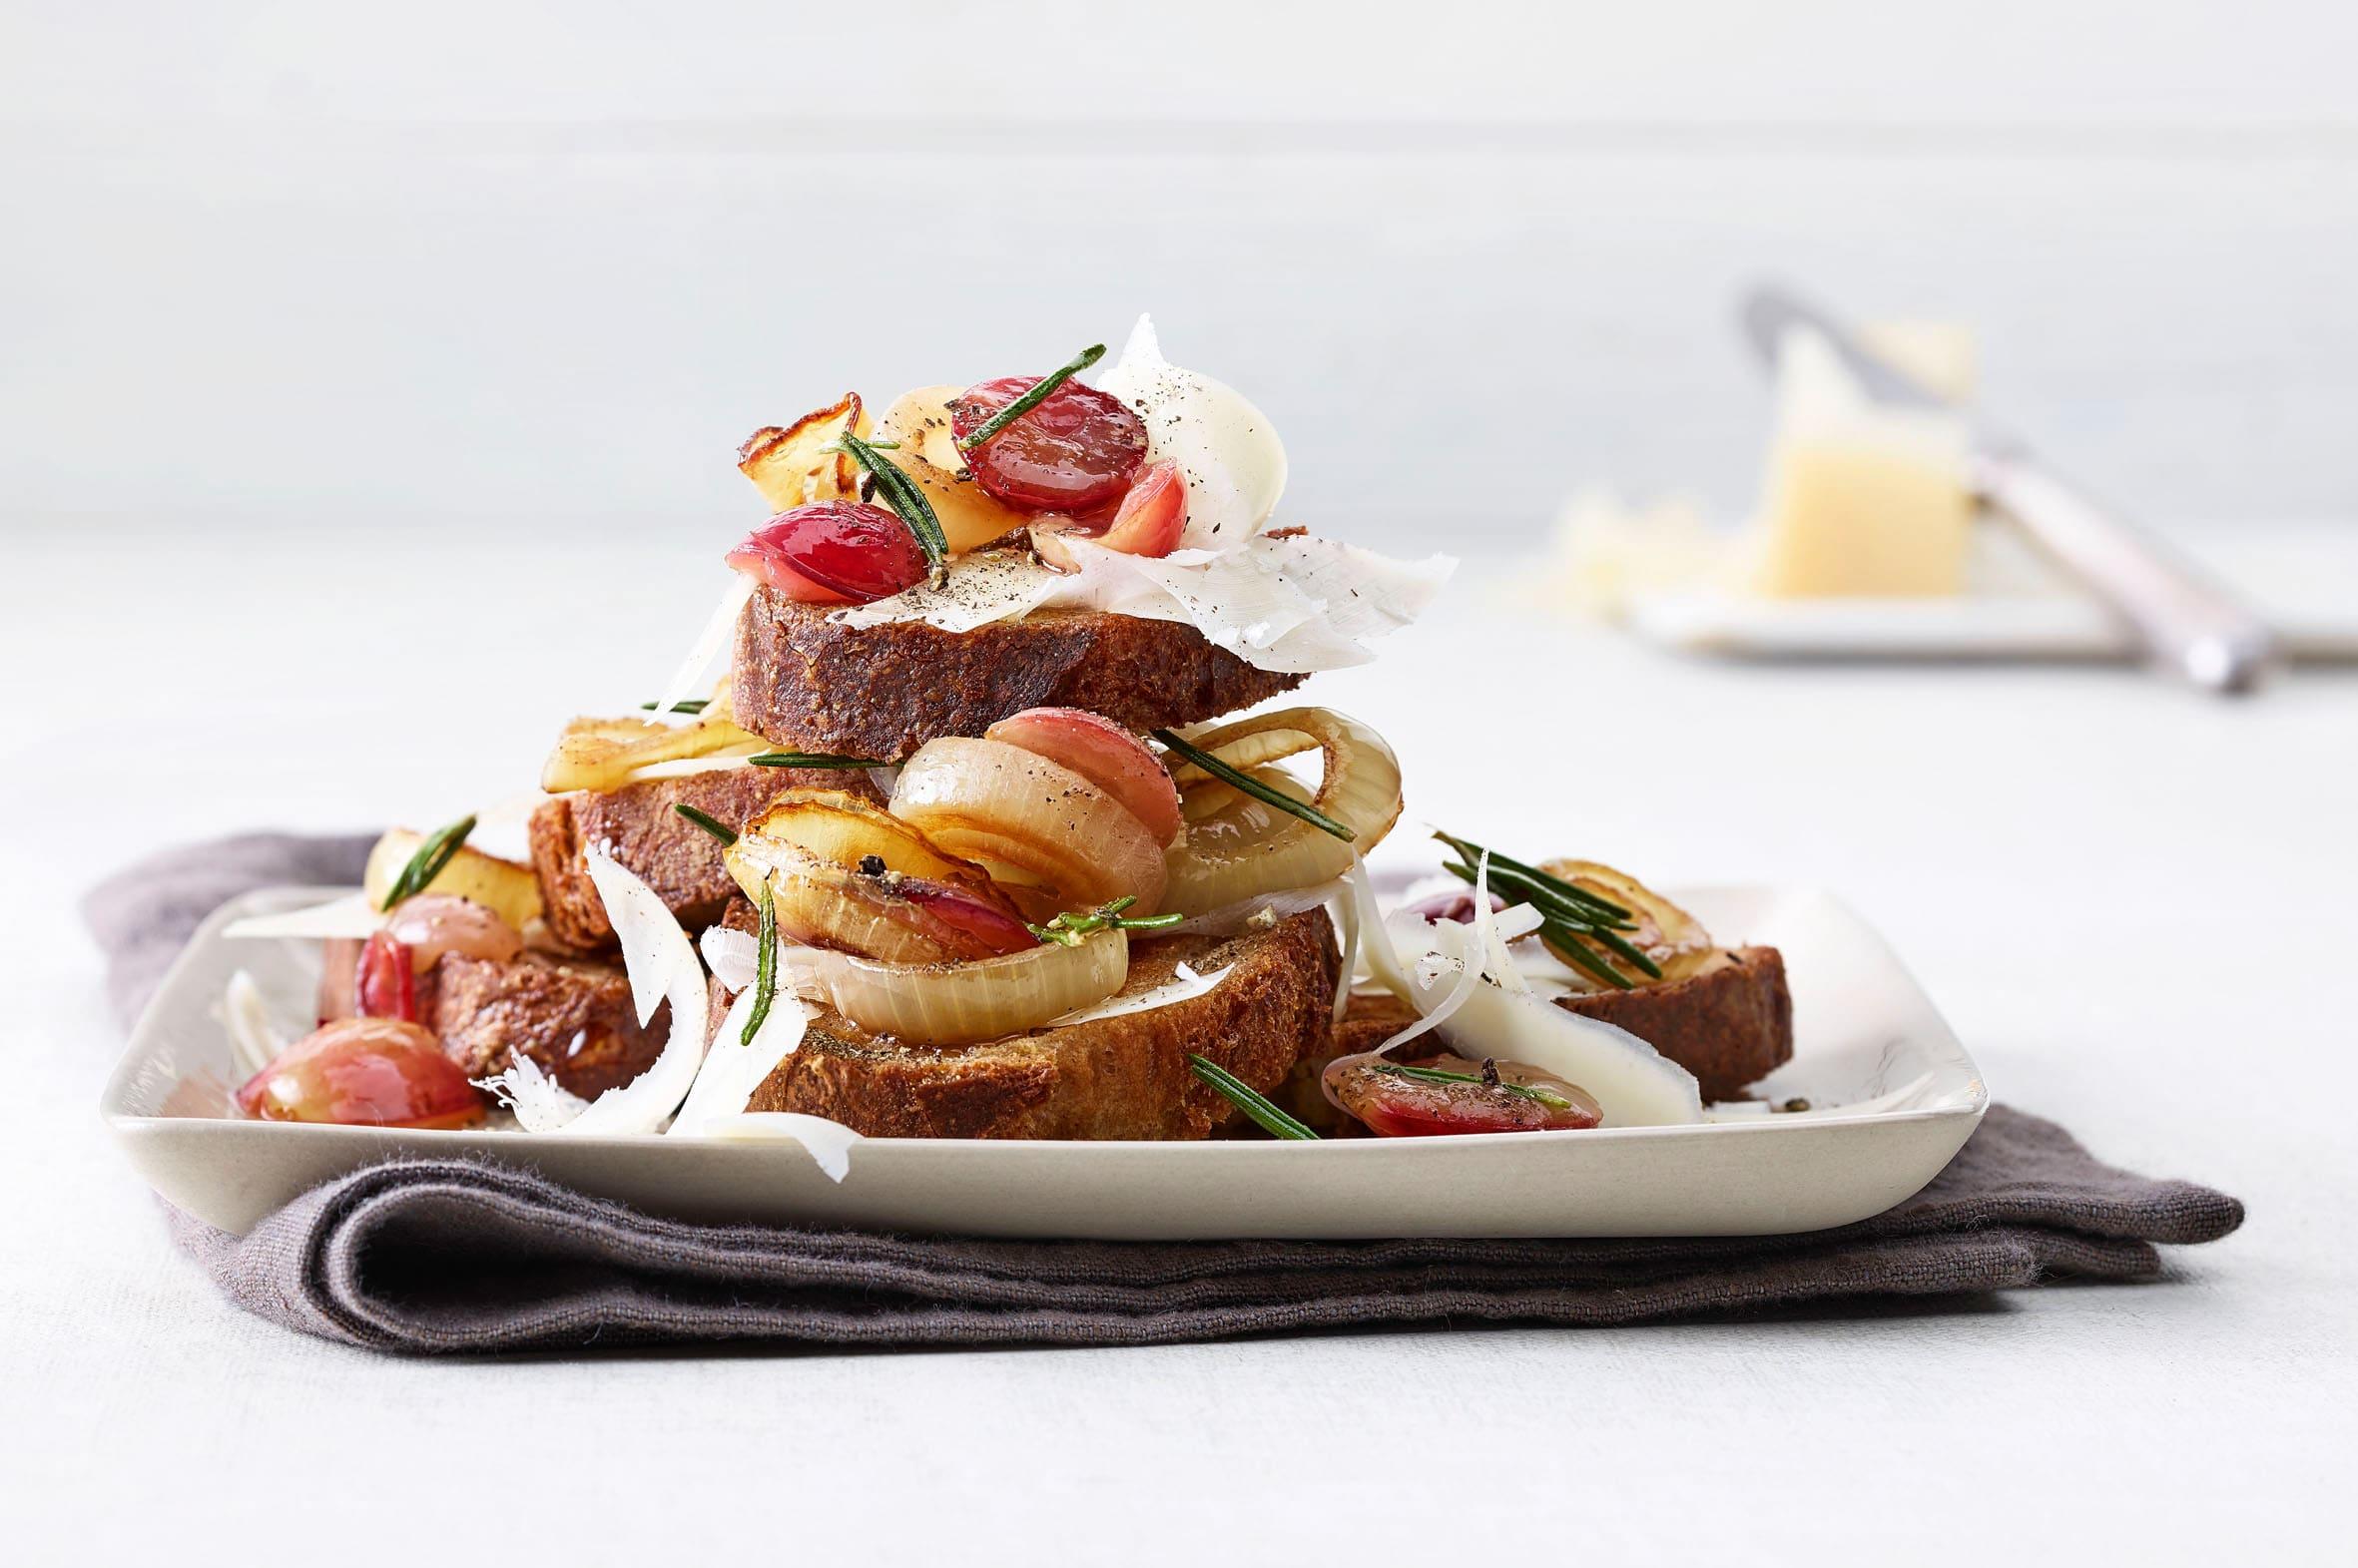 Bruschetta au Gruyère et au raisin